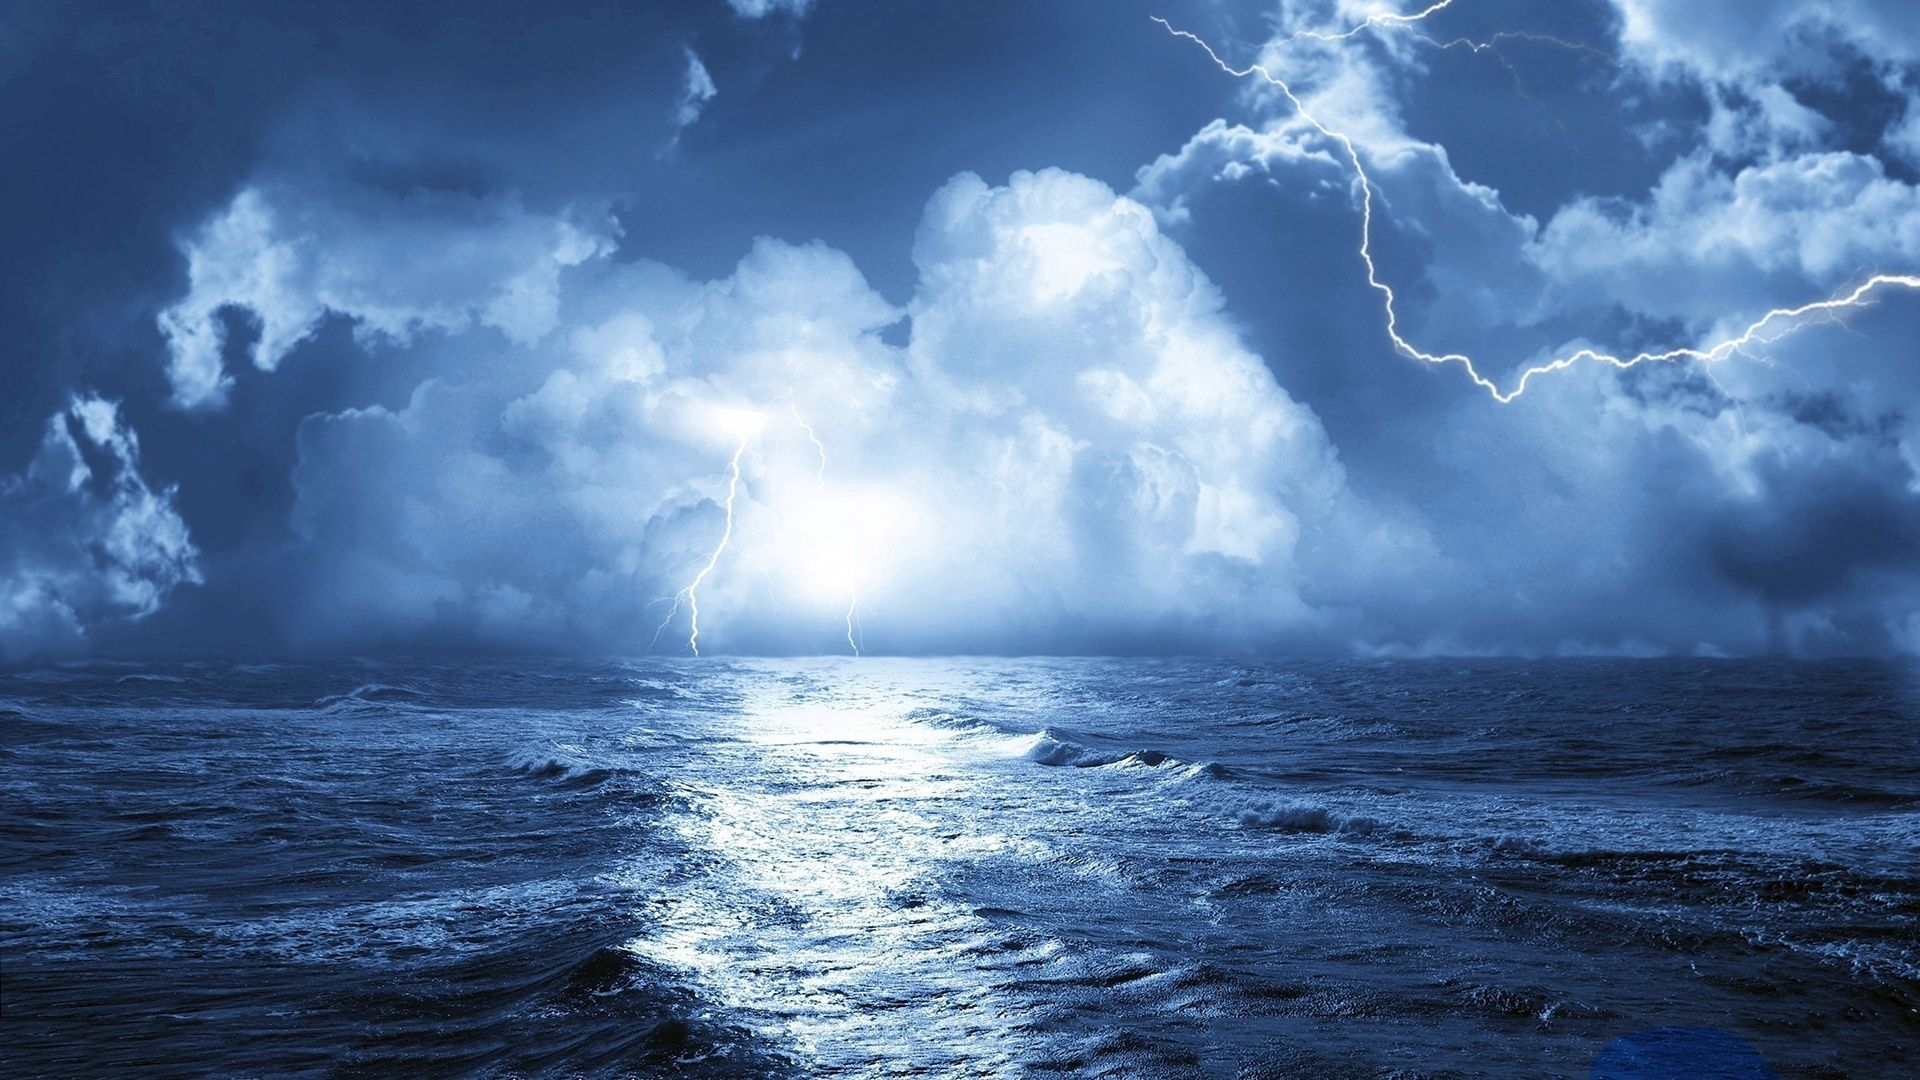 thunder storm my land pinterest sea storm ocean storm and